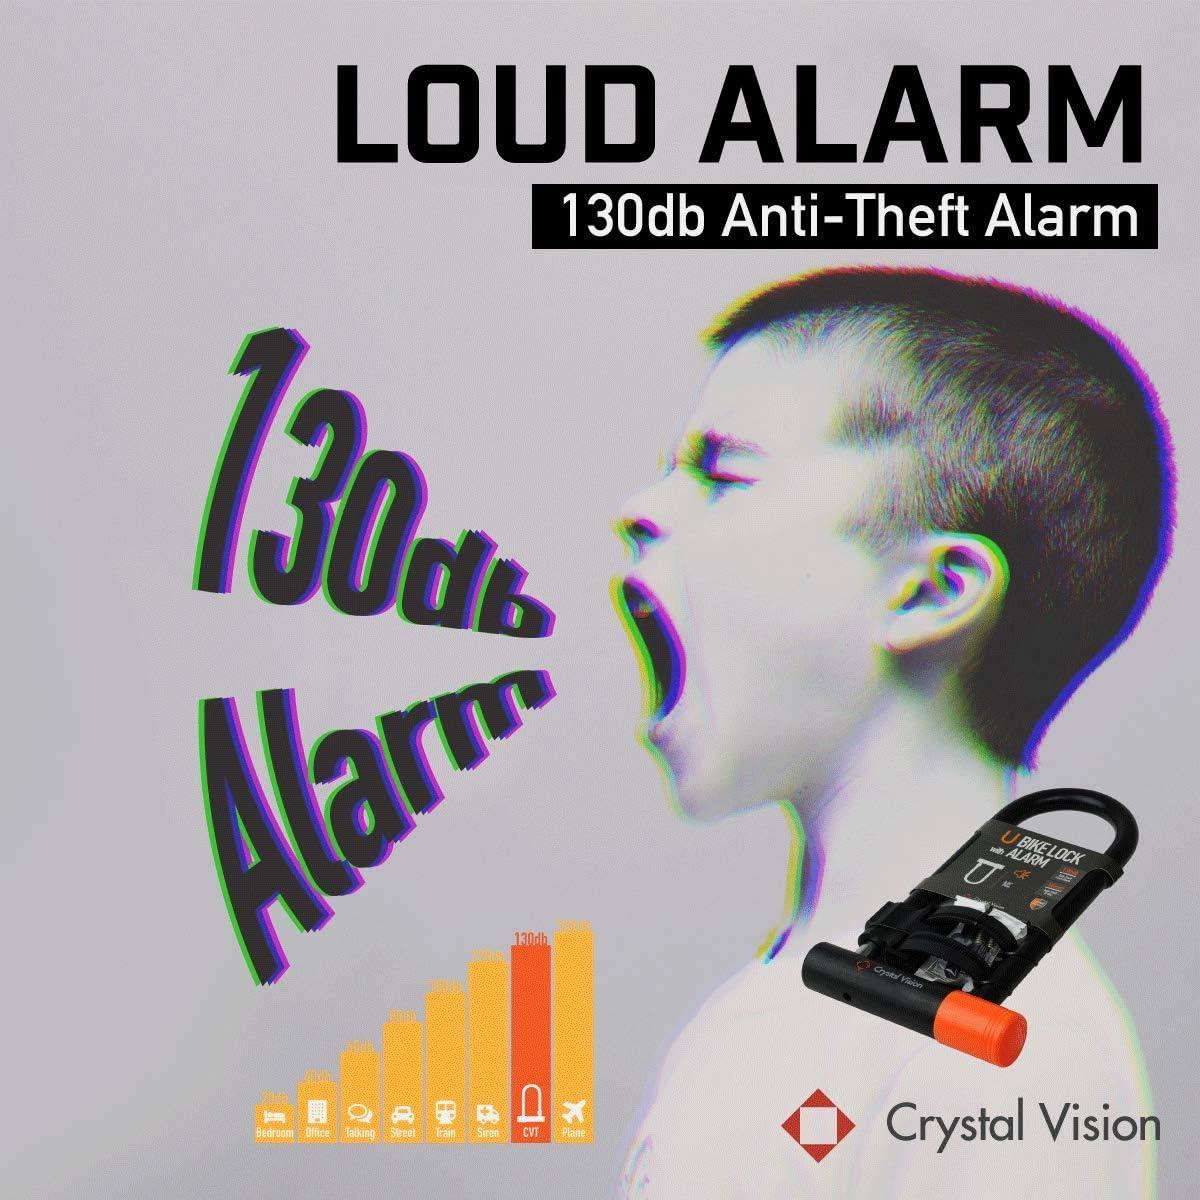 Crystal Vision SHBLA Weather Proof Anti Theft Alarm Bike Lock Loud 130db